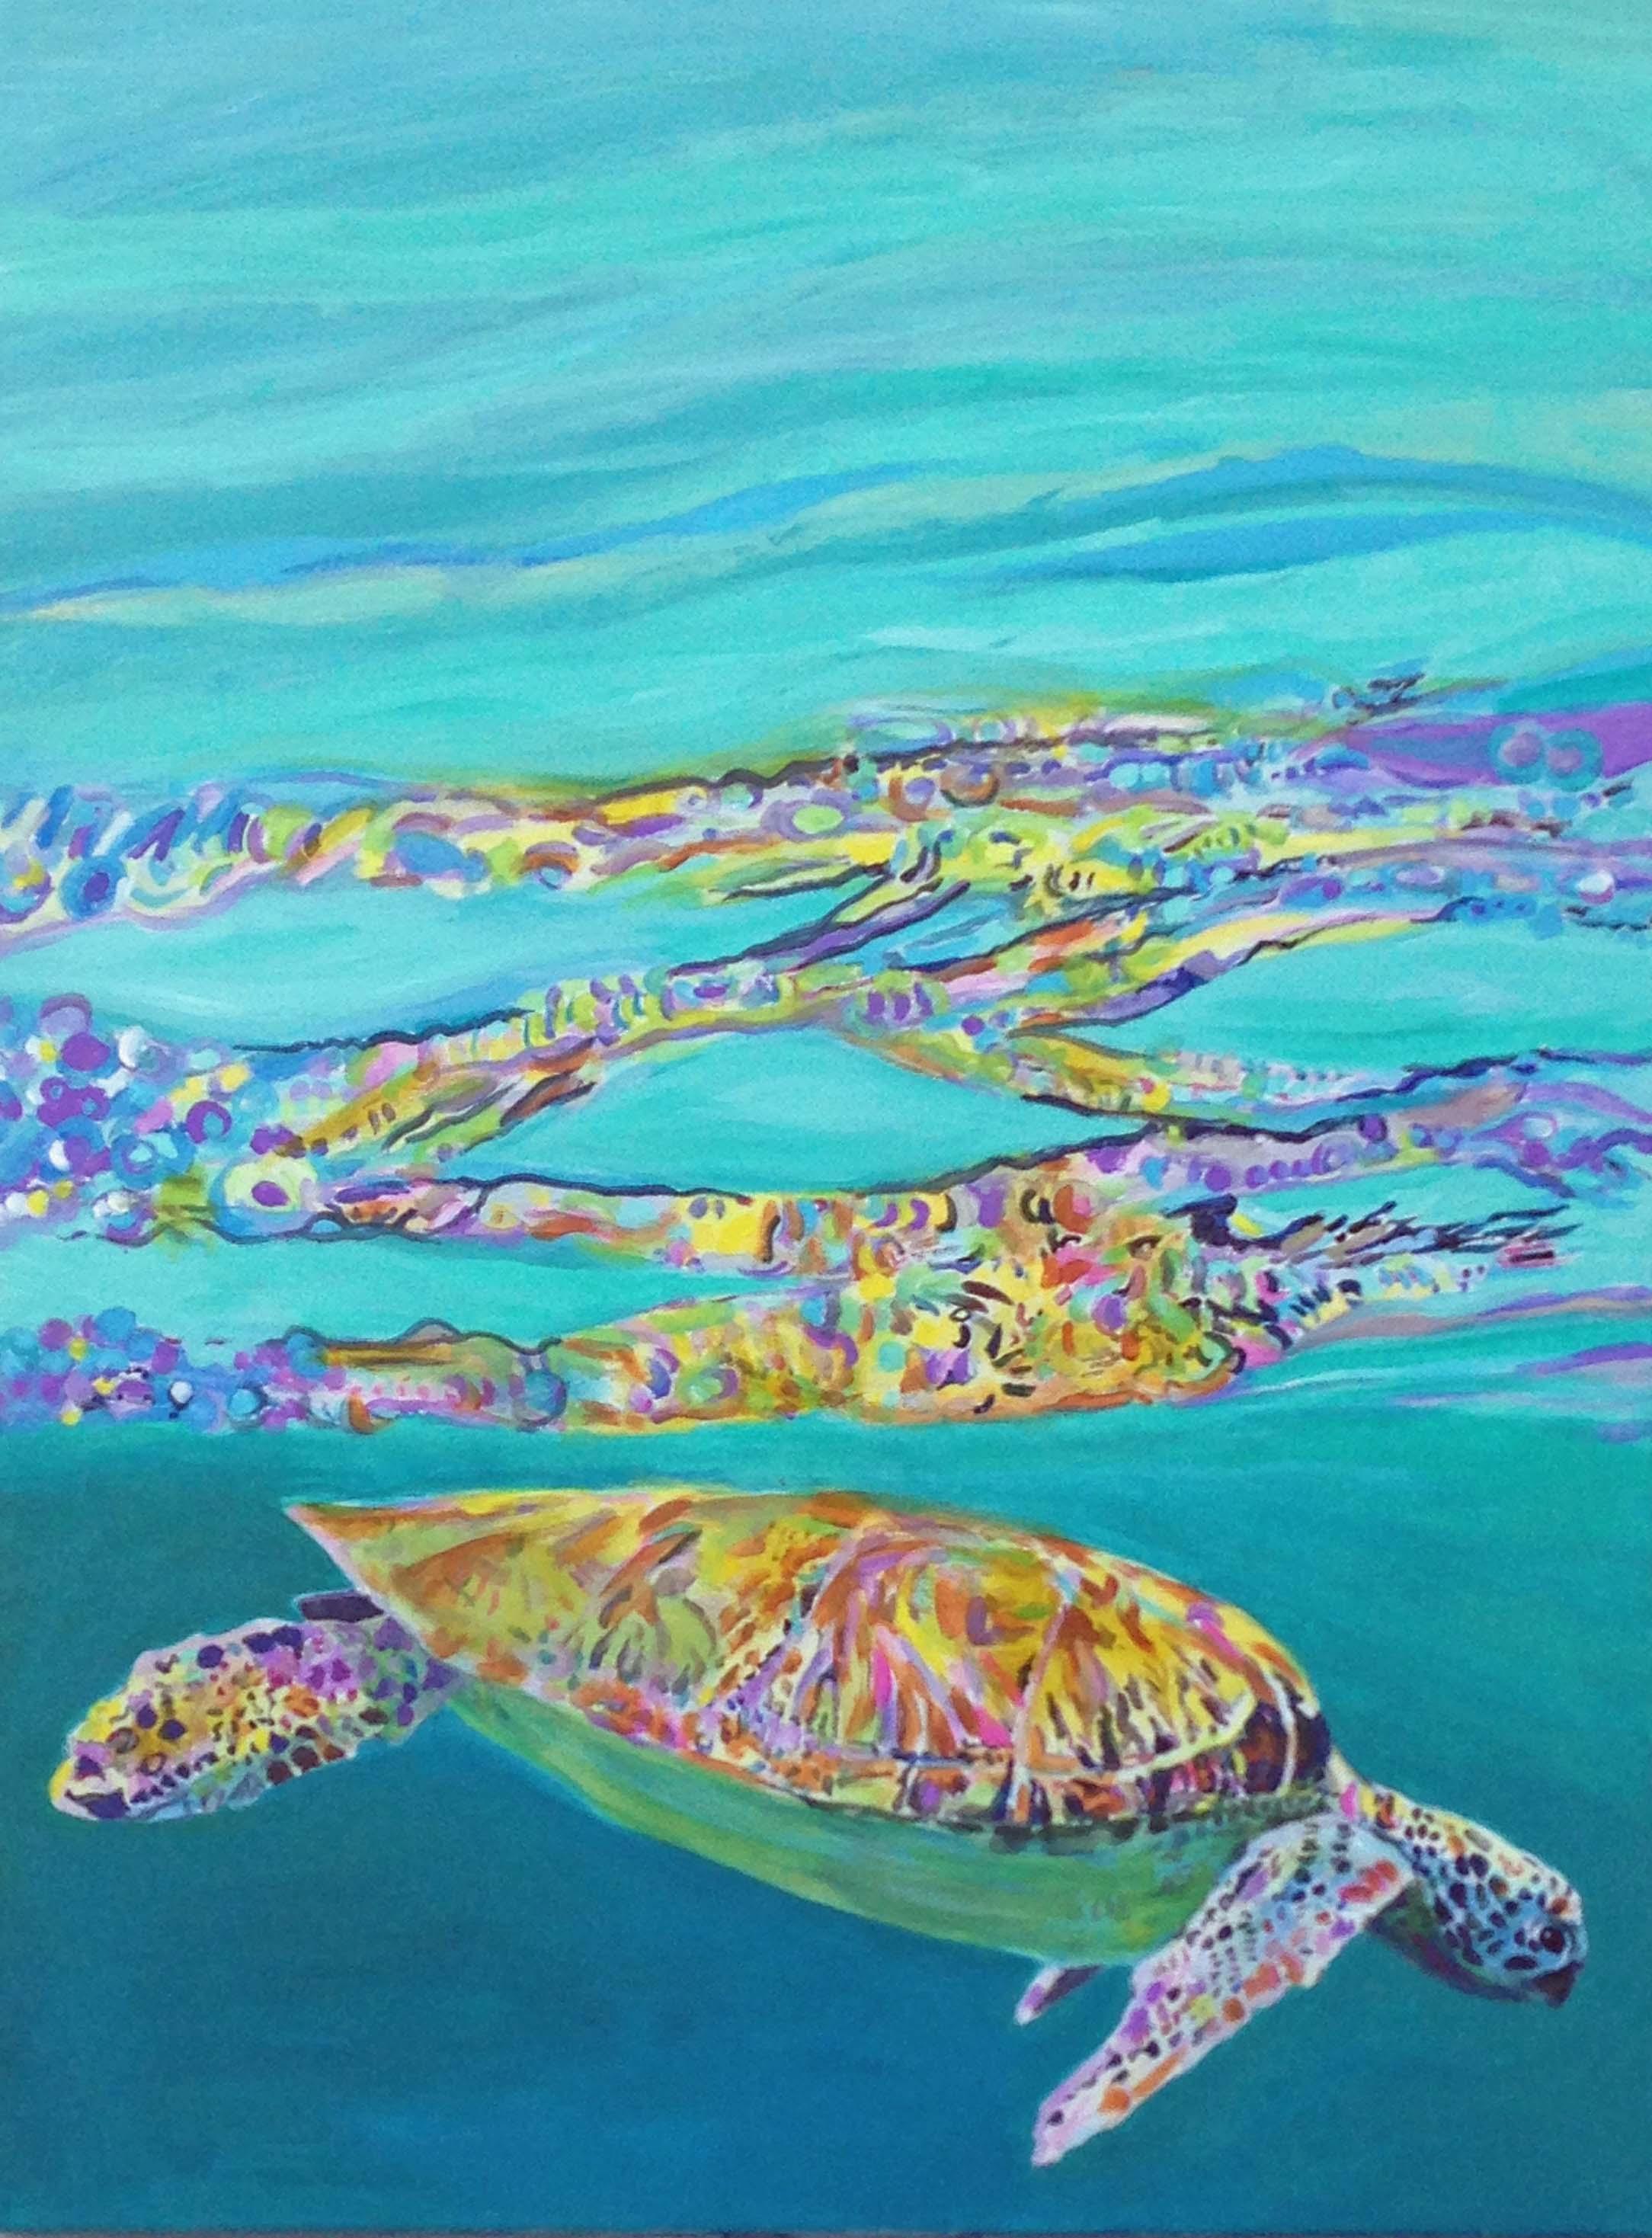 sea turtle tuesday u2013 kim rody ocean art